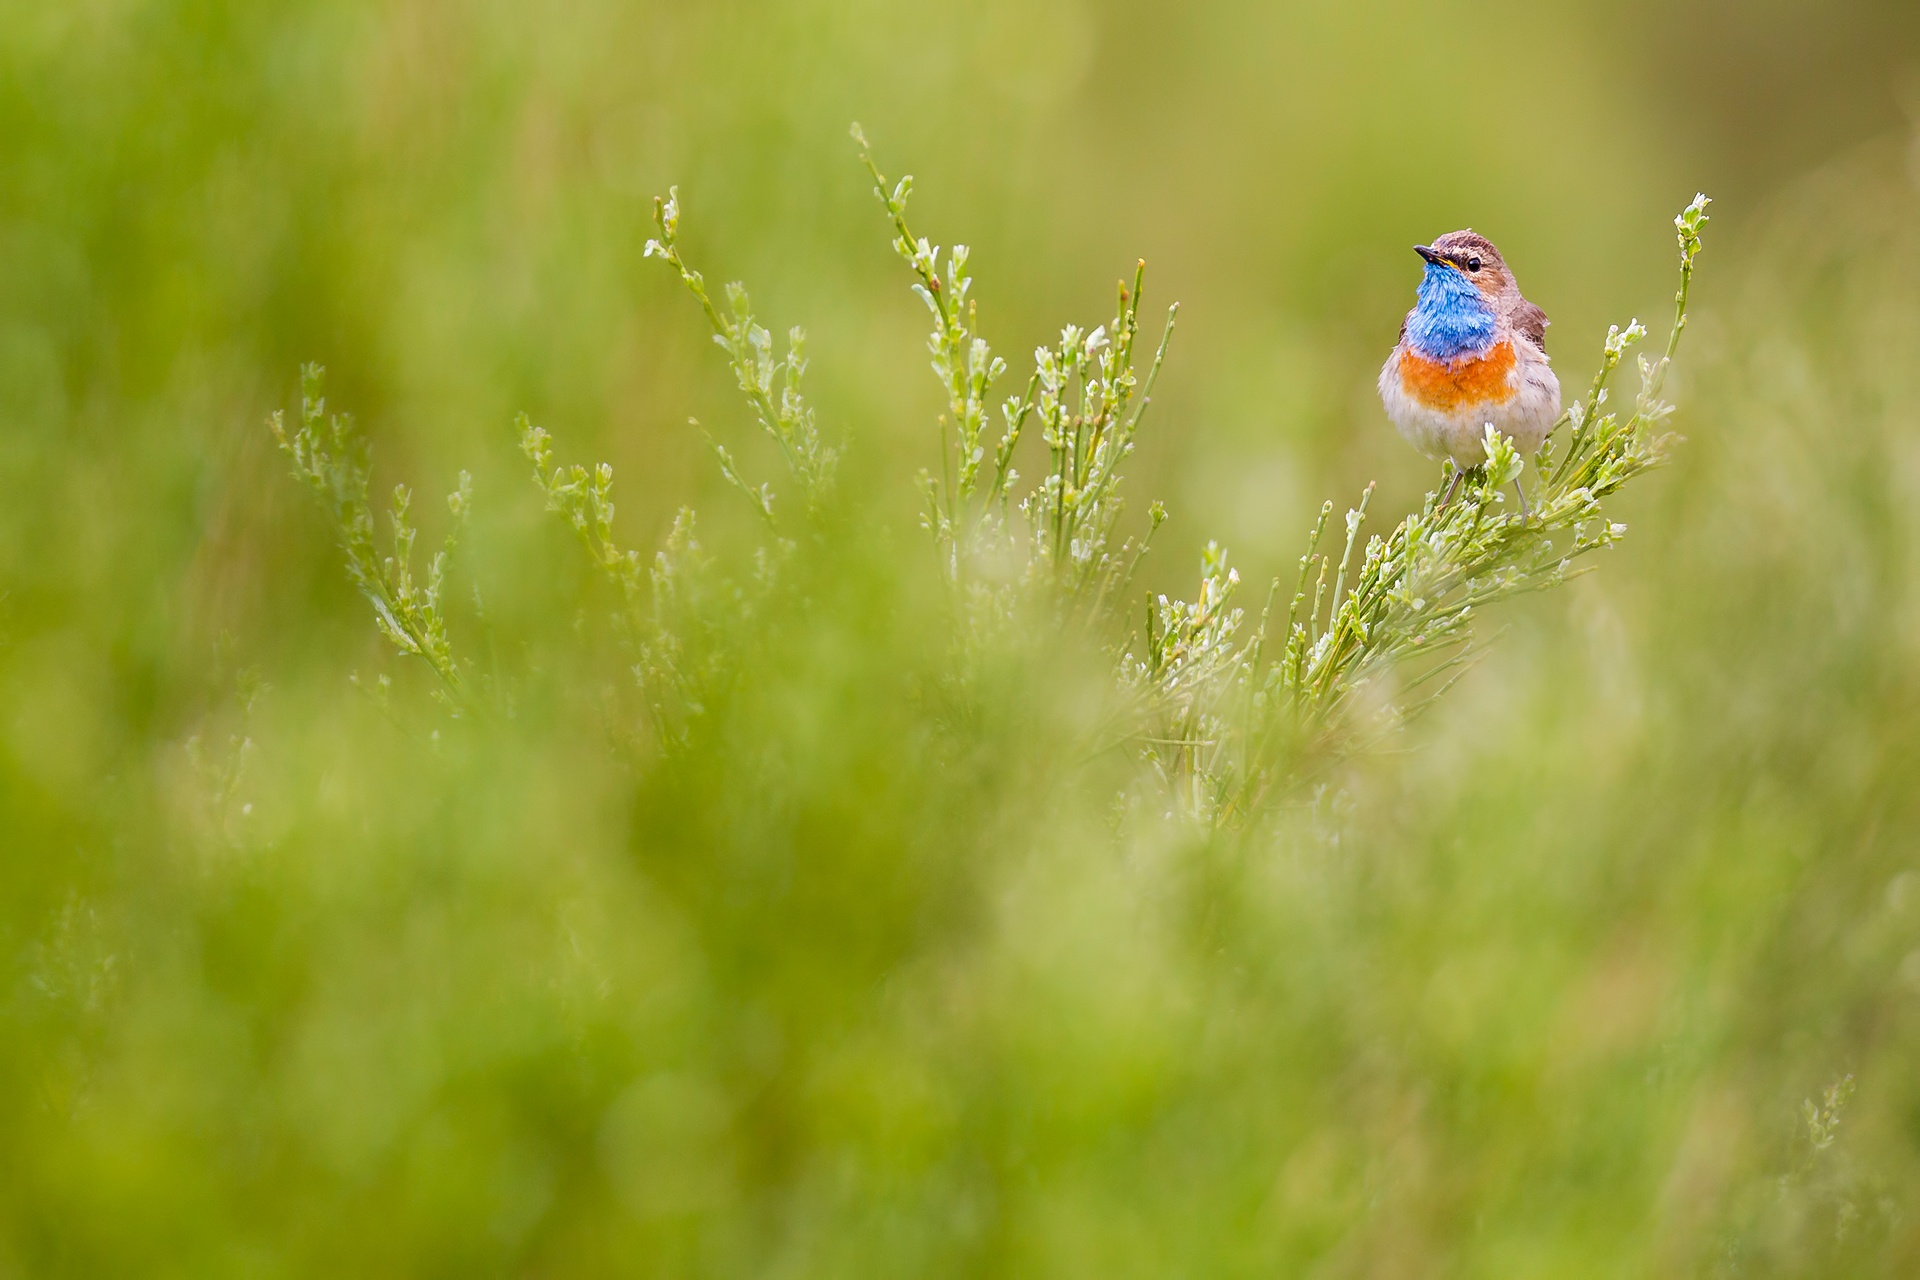 Blue patch - Mario Suarez - Portfolio Natural, Fotografía de Naturaleza de Autor